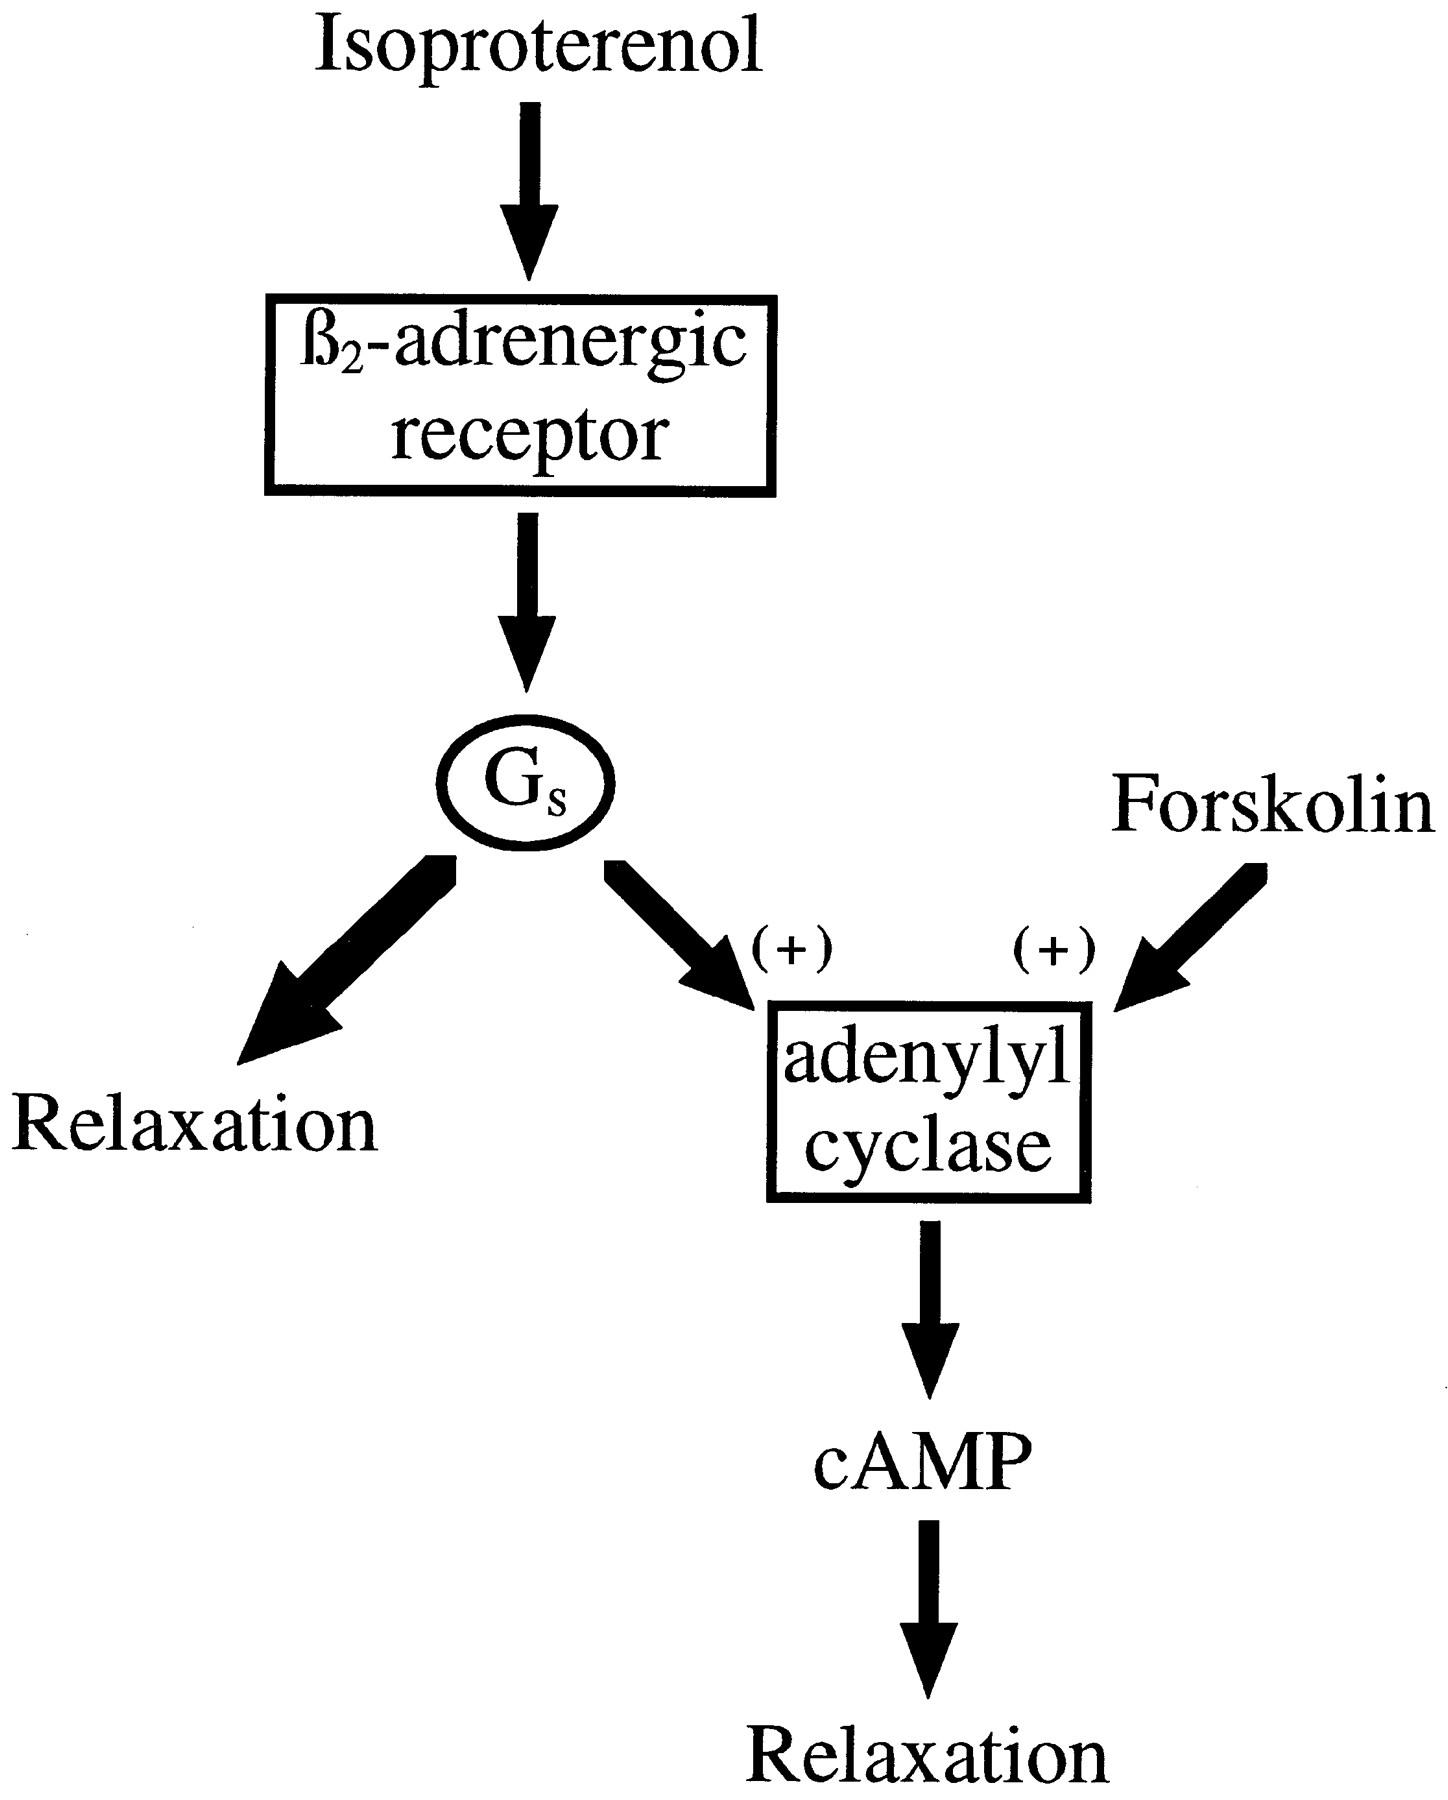 M2 Muscarinic Receptors Inhibit Forskolin- but not